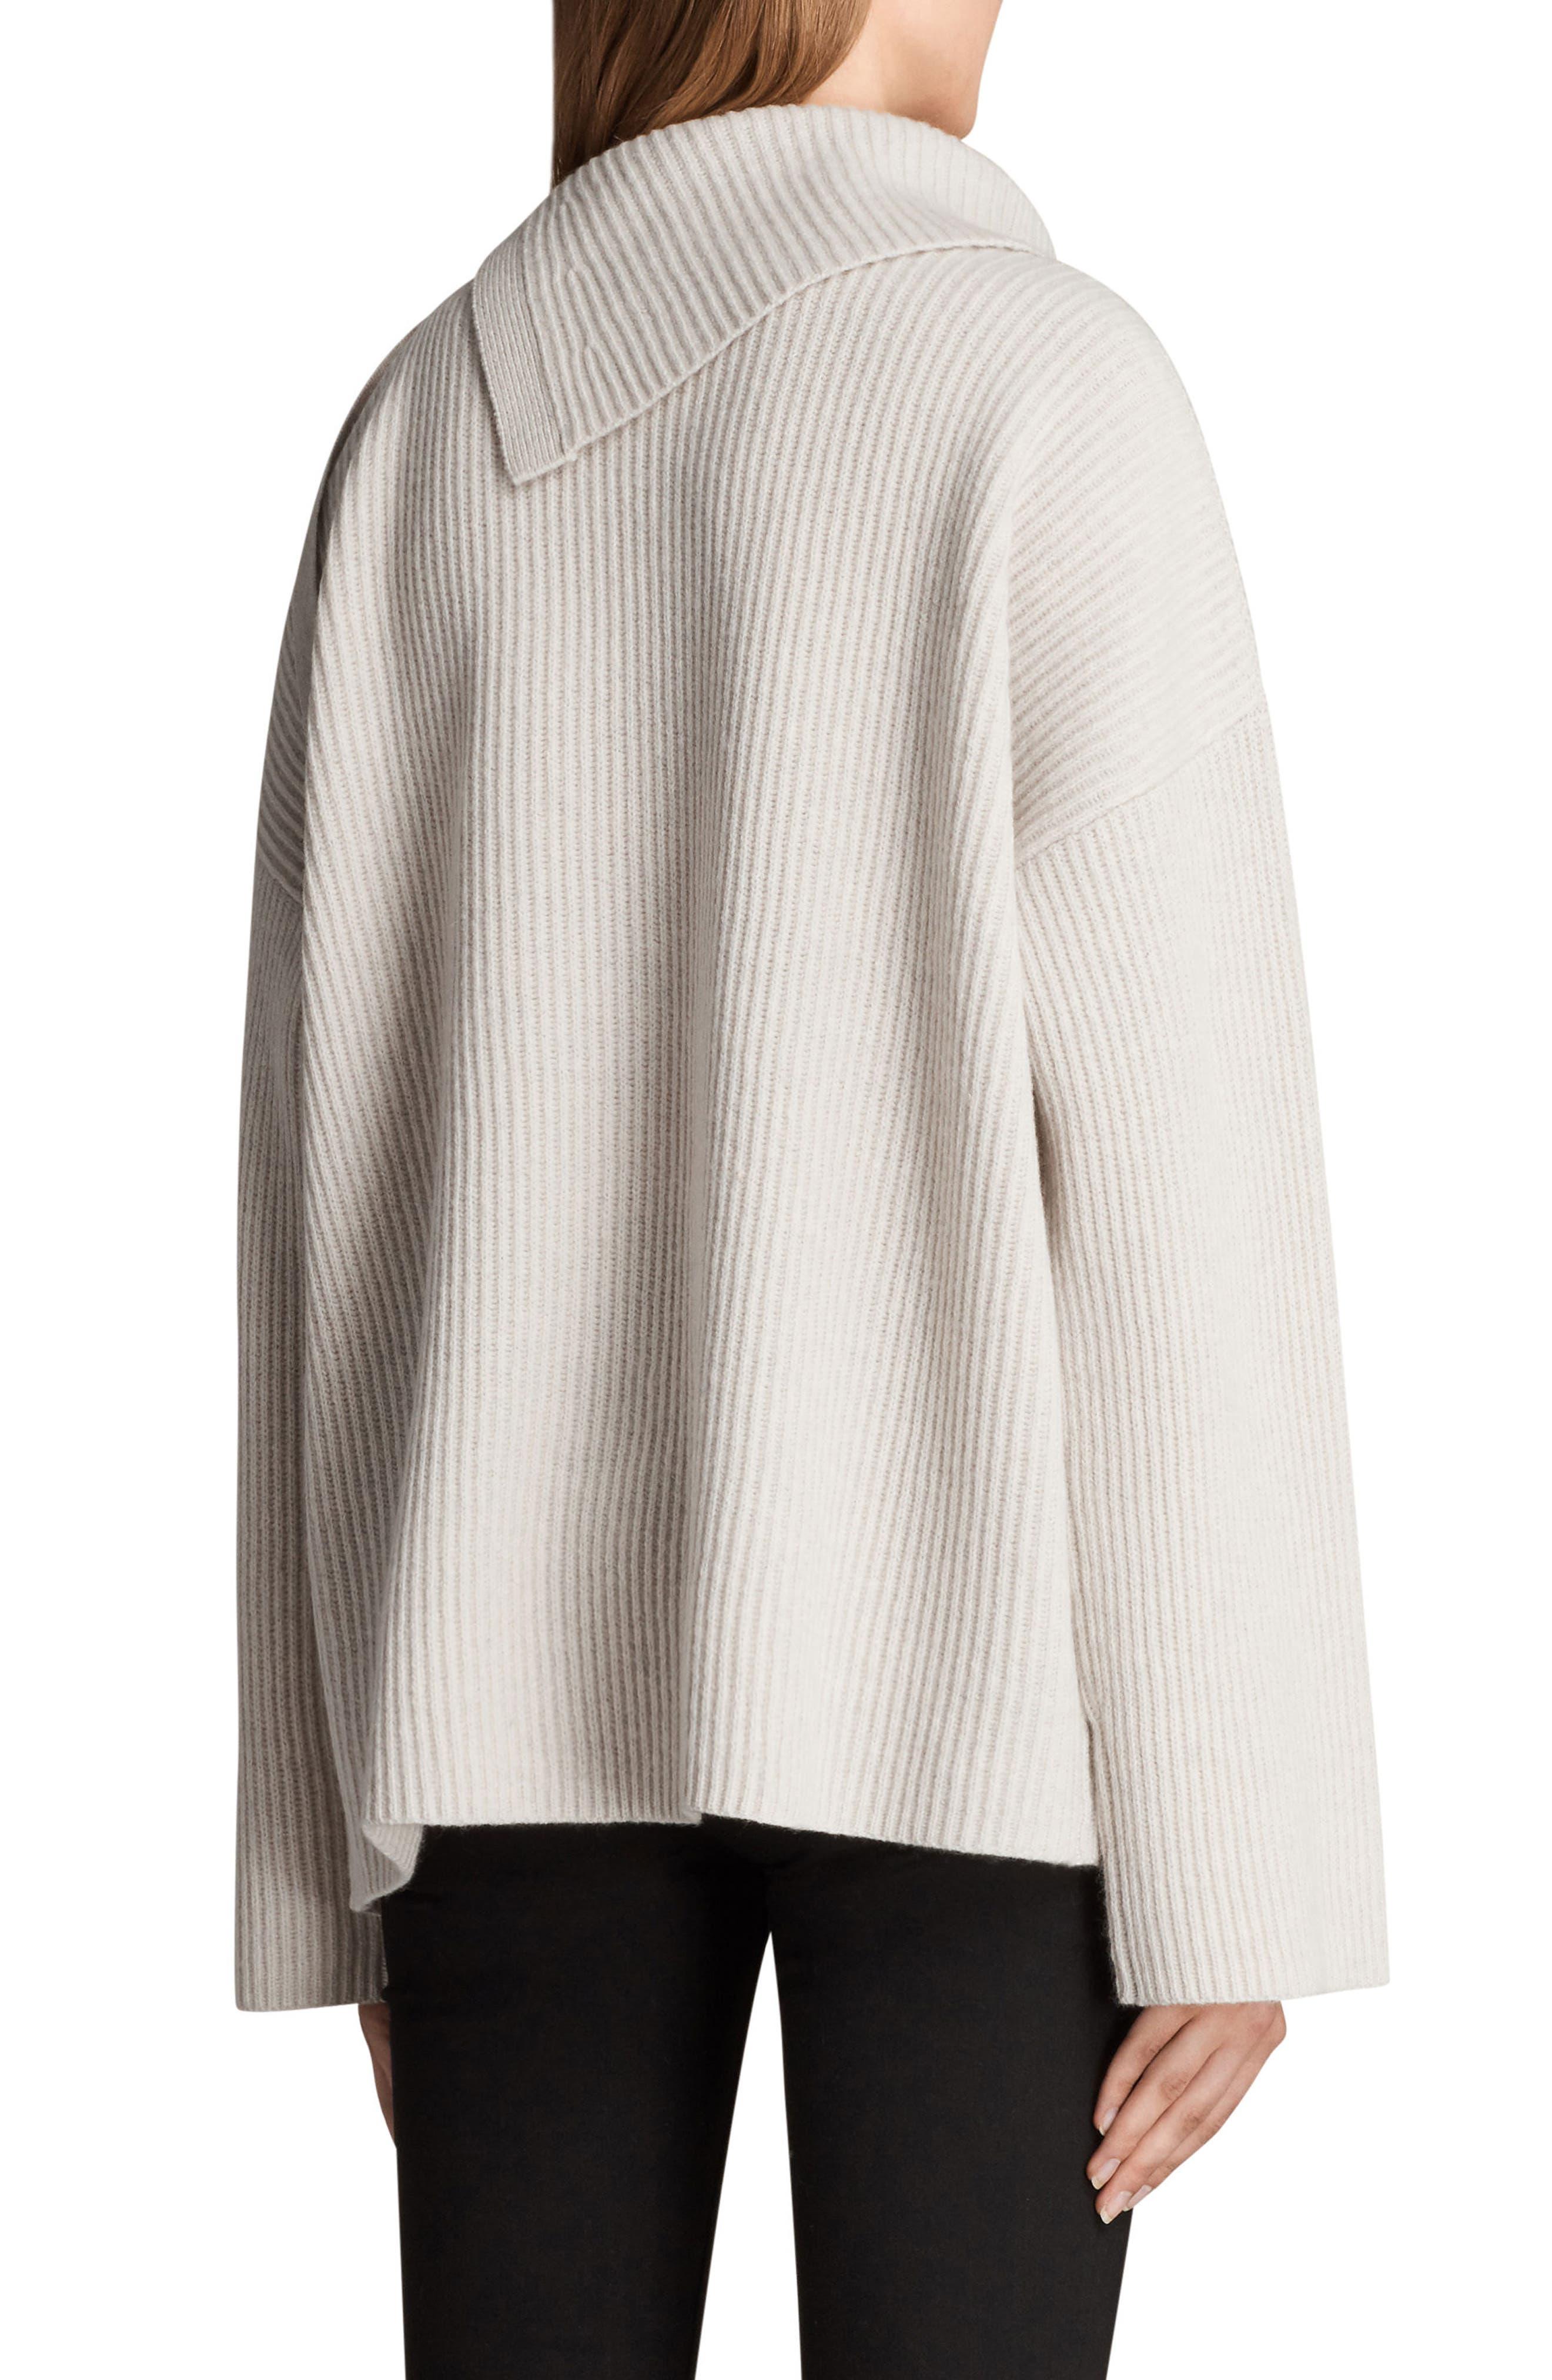 Sura Tie Neck Sweater,                             Alternate thumbnail 2, color,                             Wild Oat